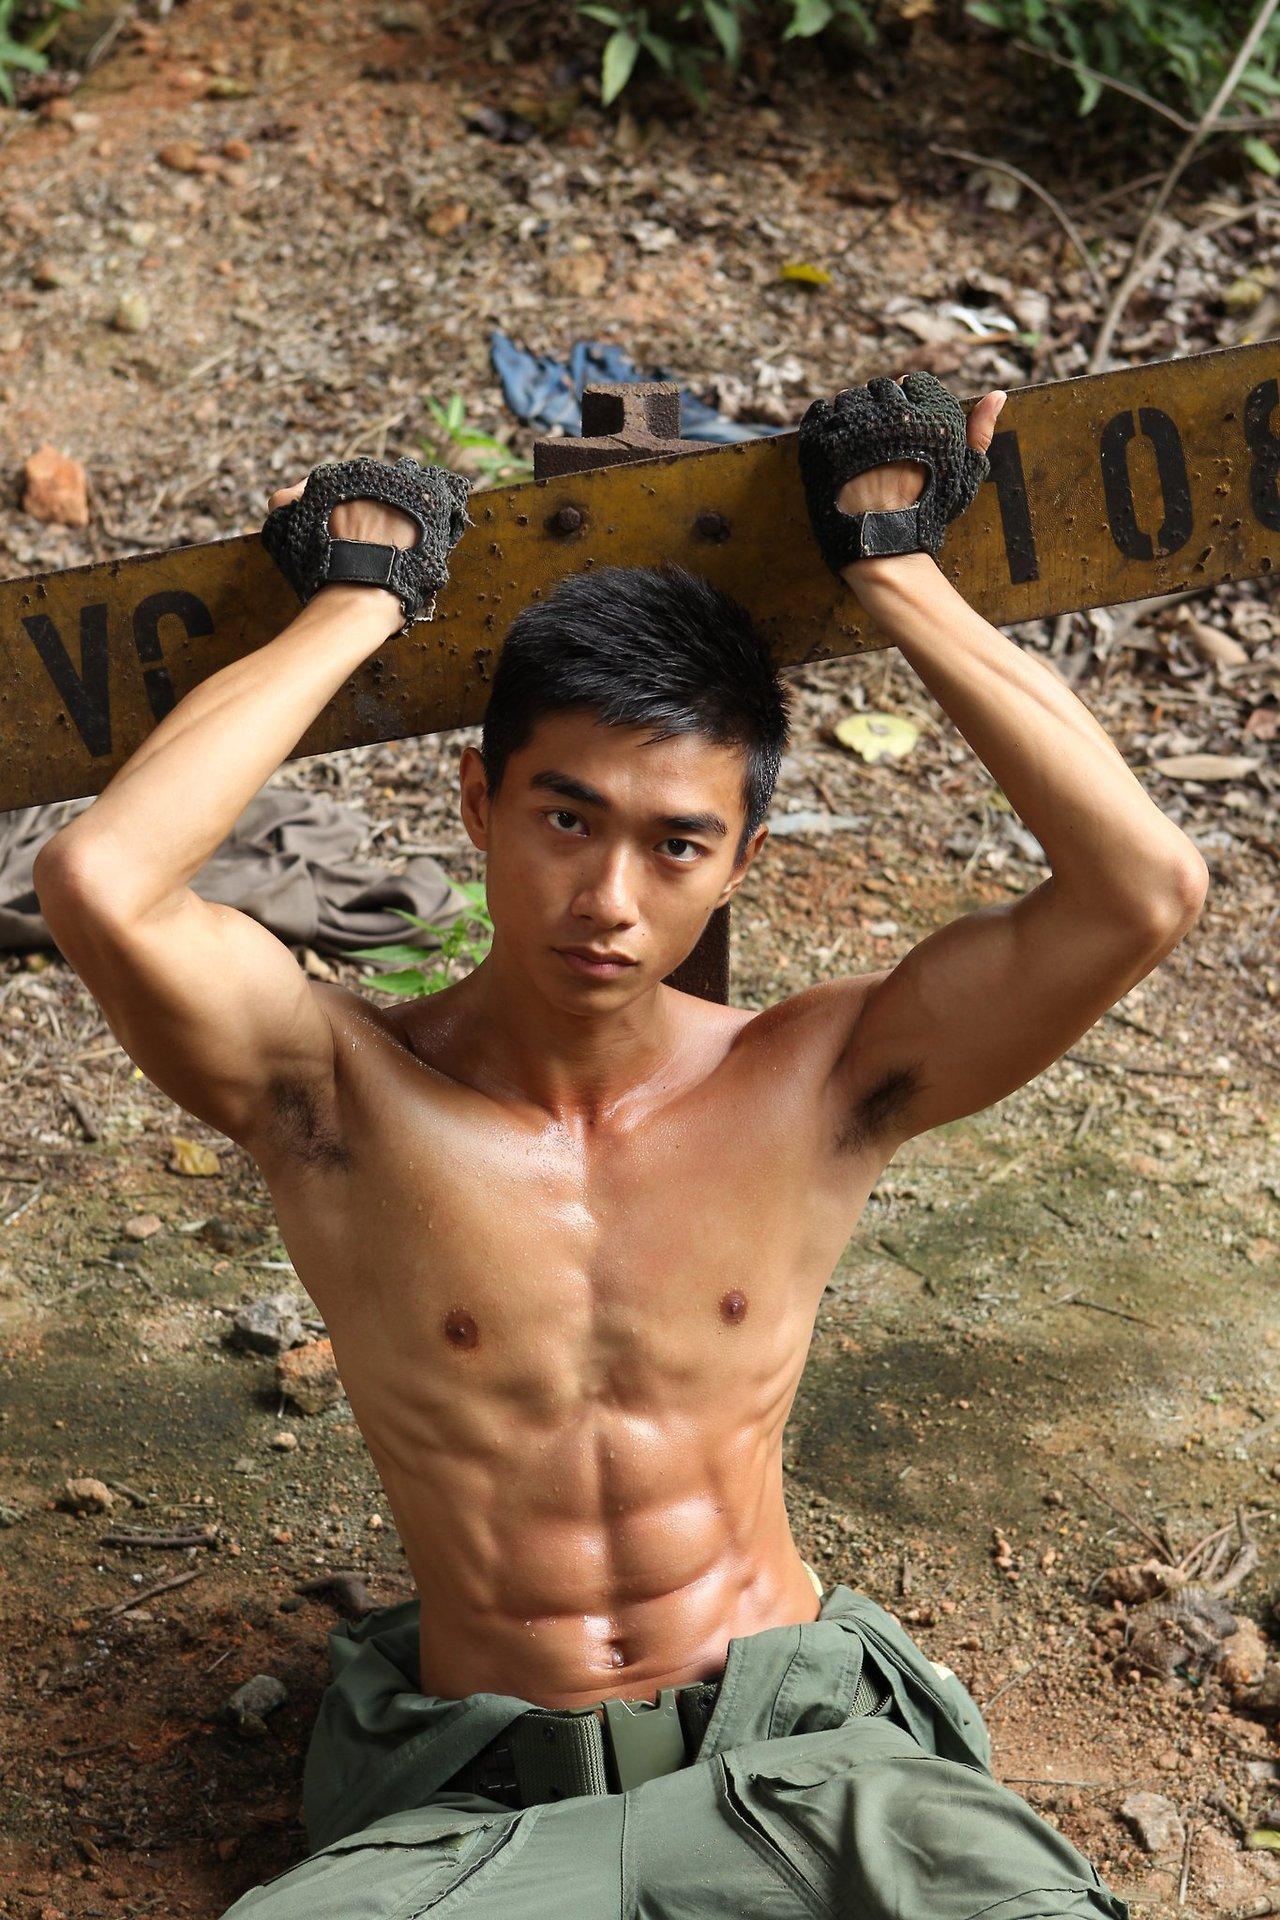 Young shirtless asian boys, erika heaven nude